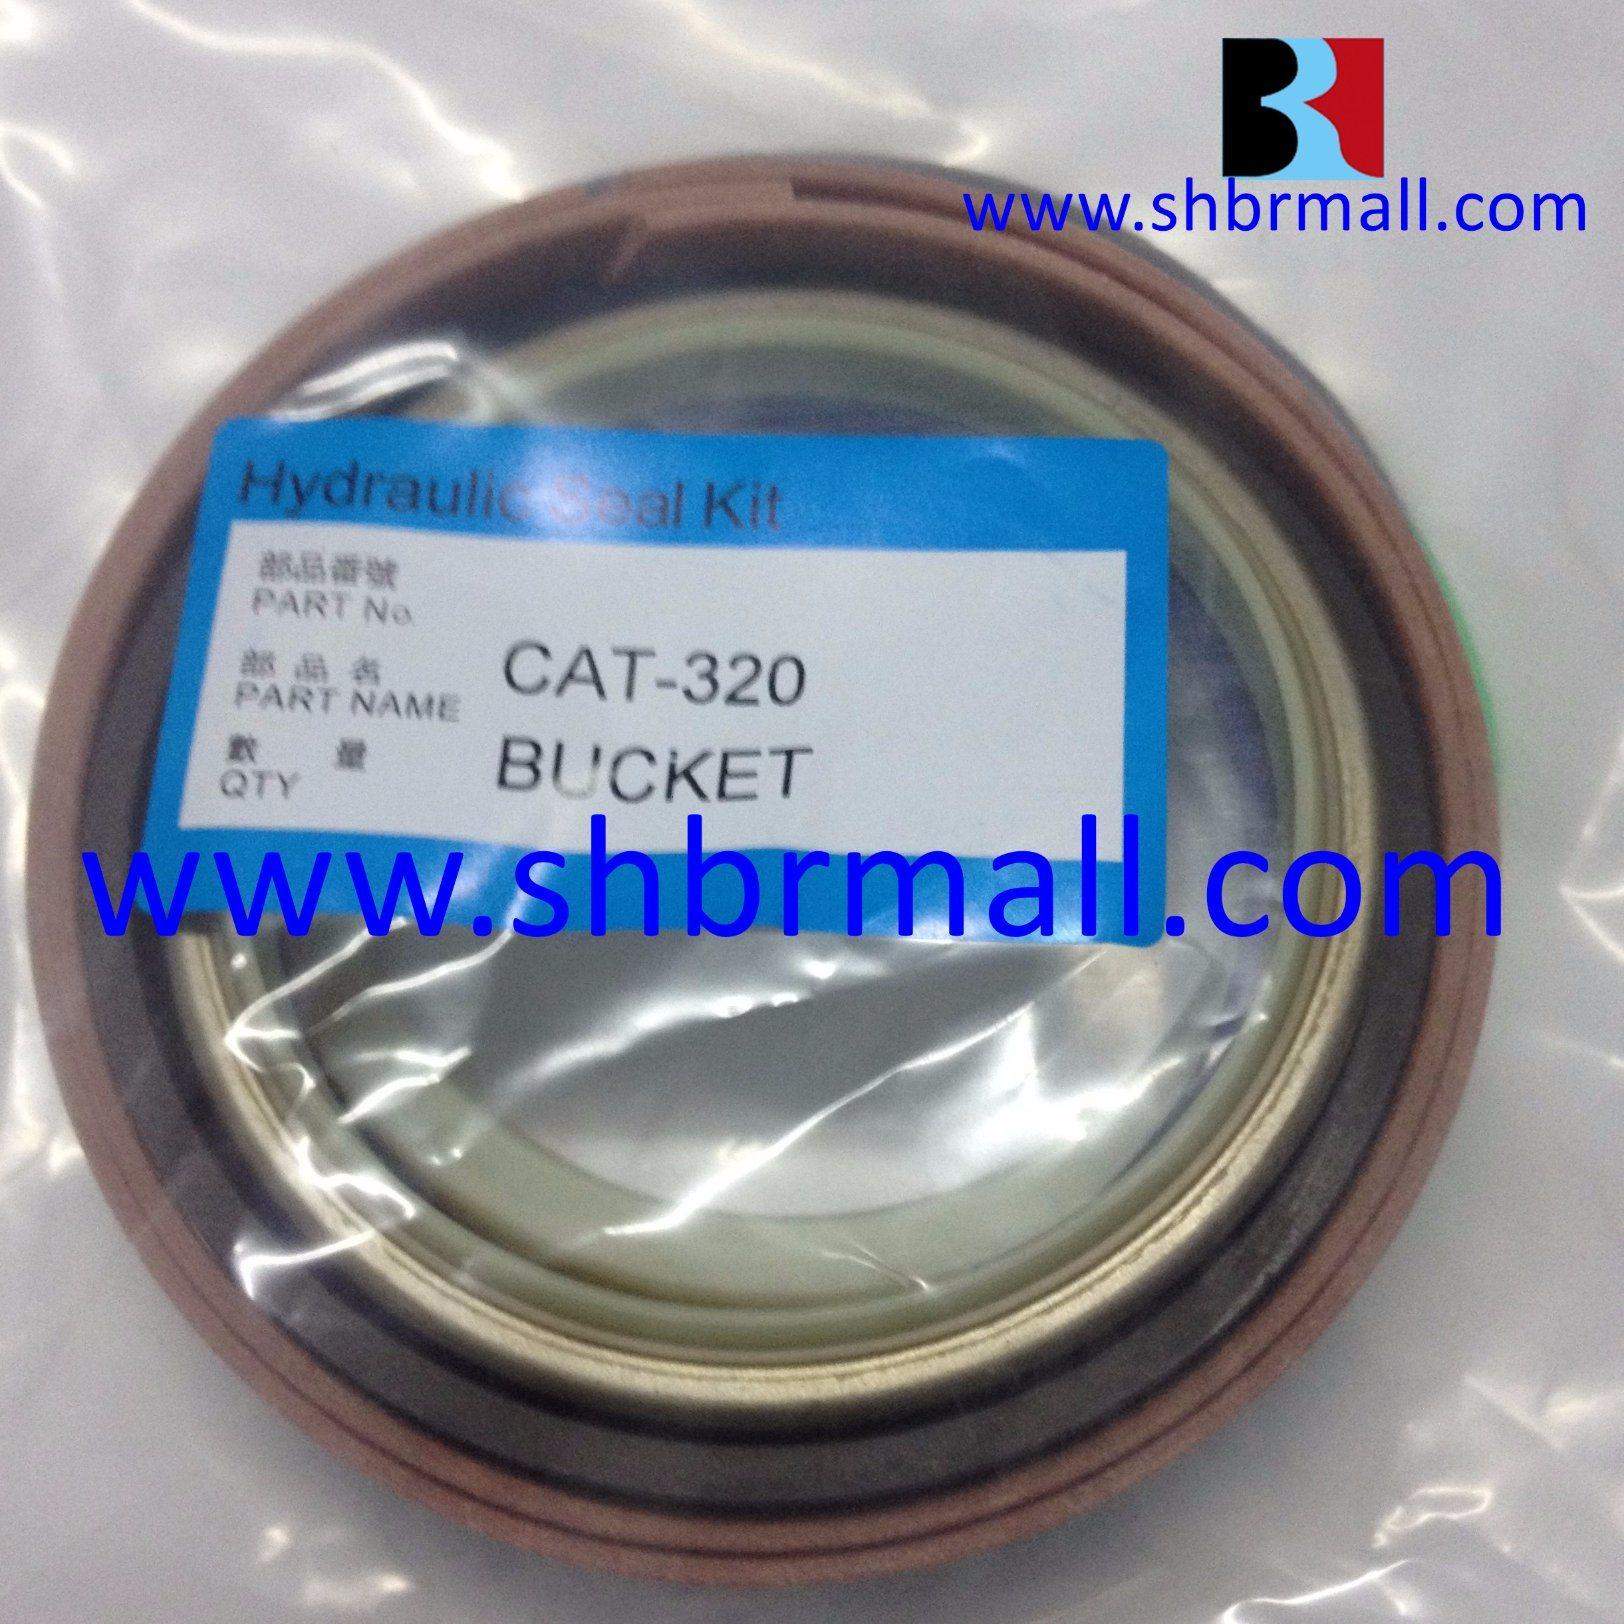 [Hot Item] Aftermarket Cat-320 Bucket Cylinder Seal Kits